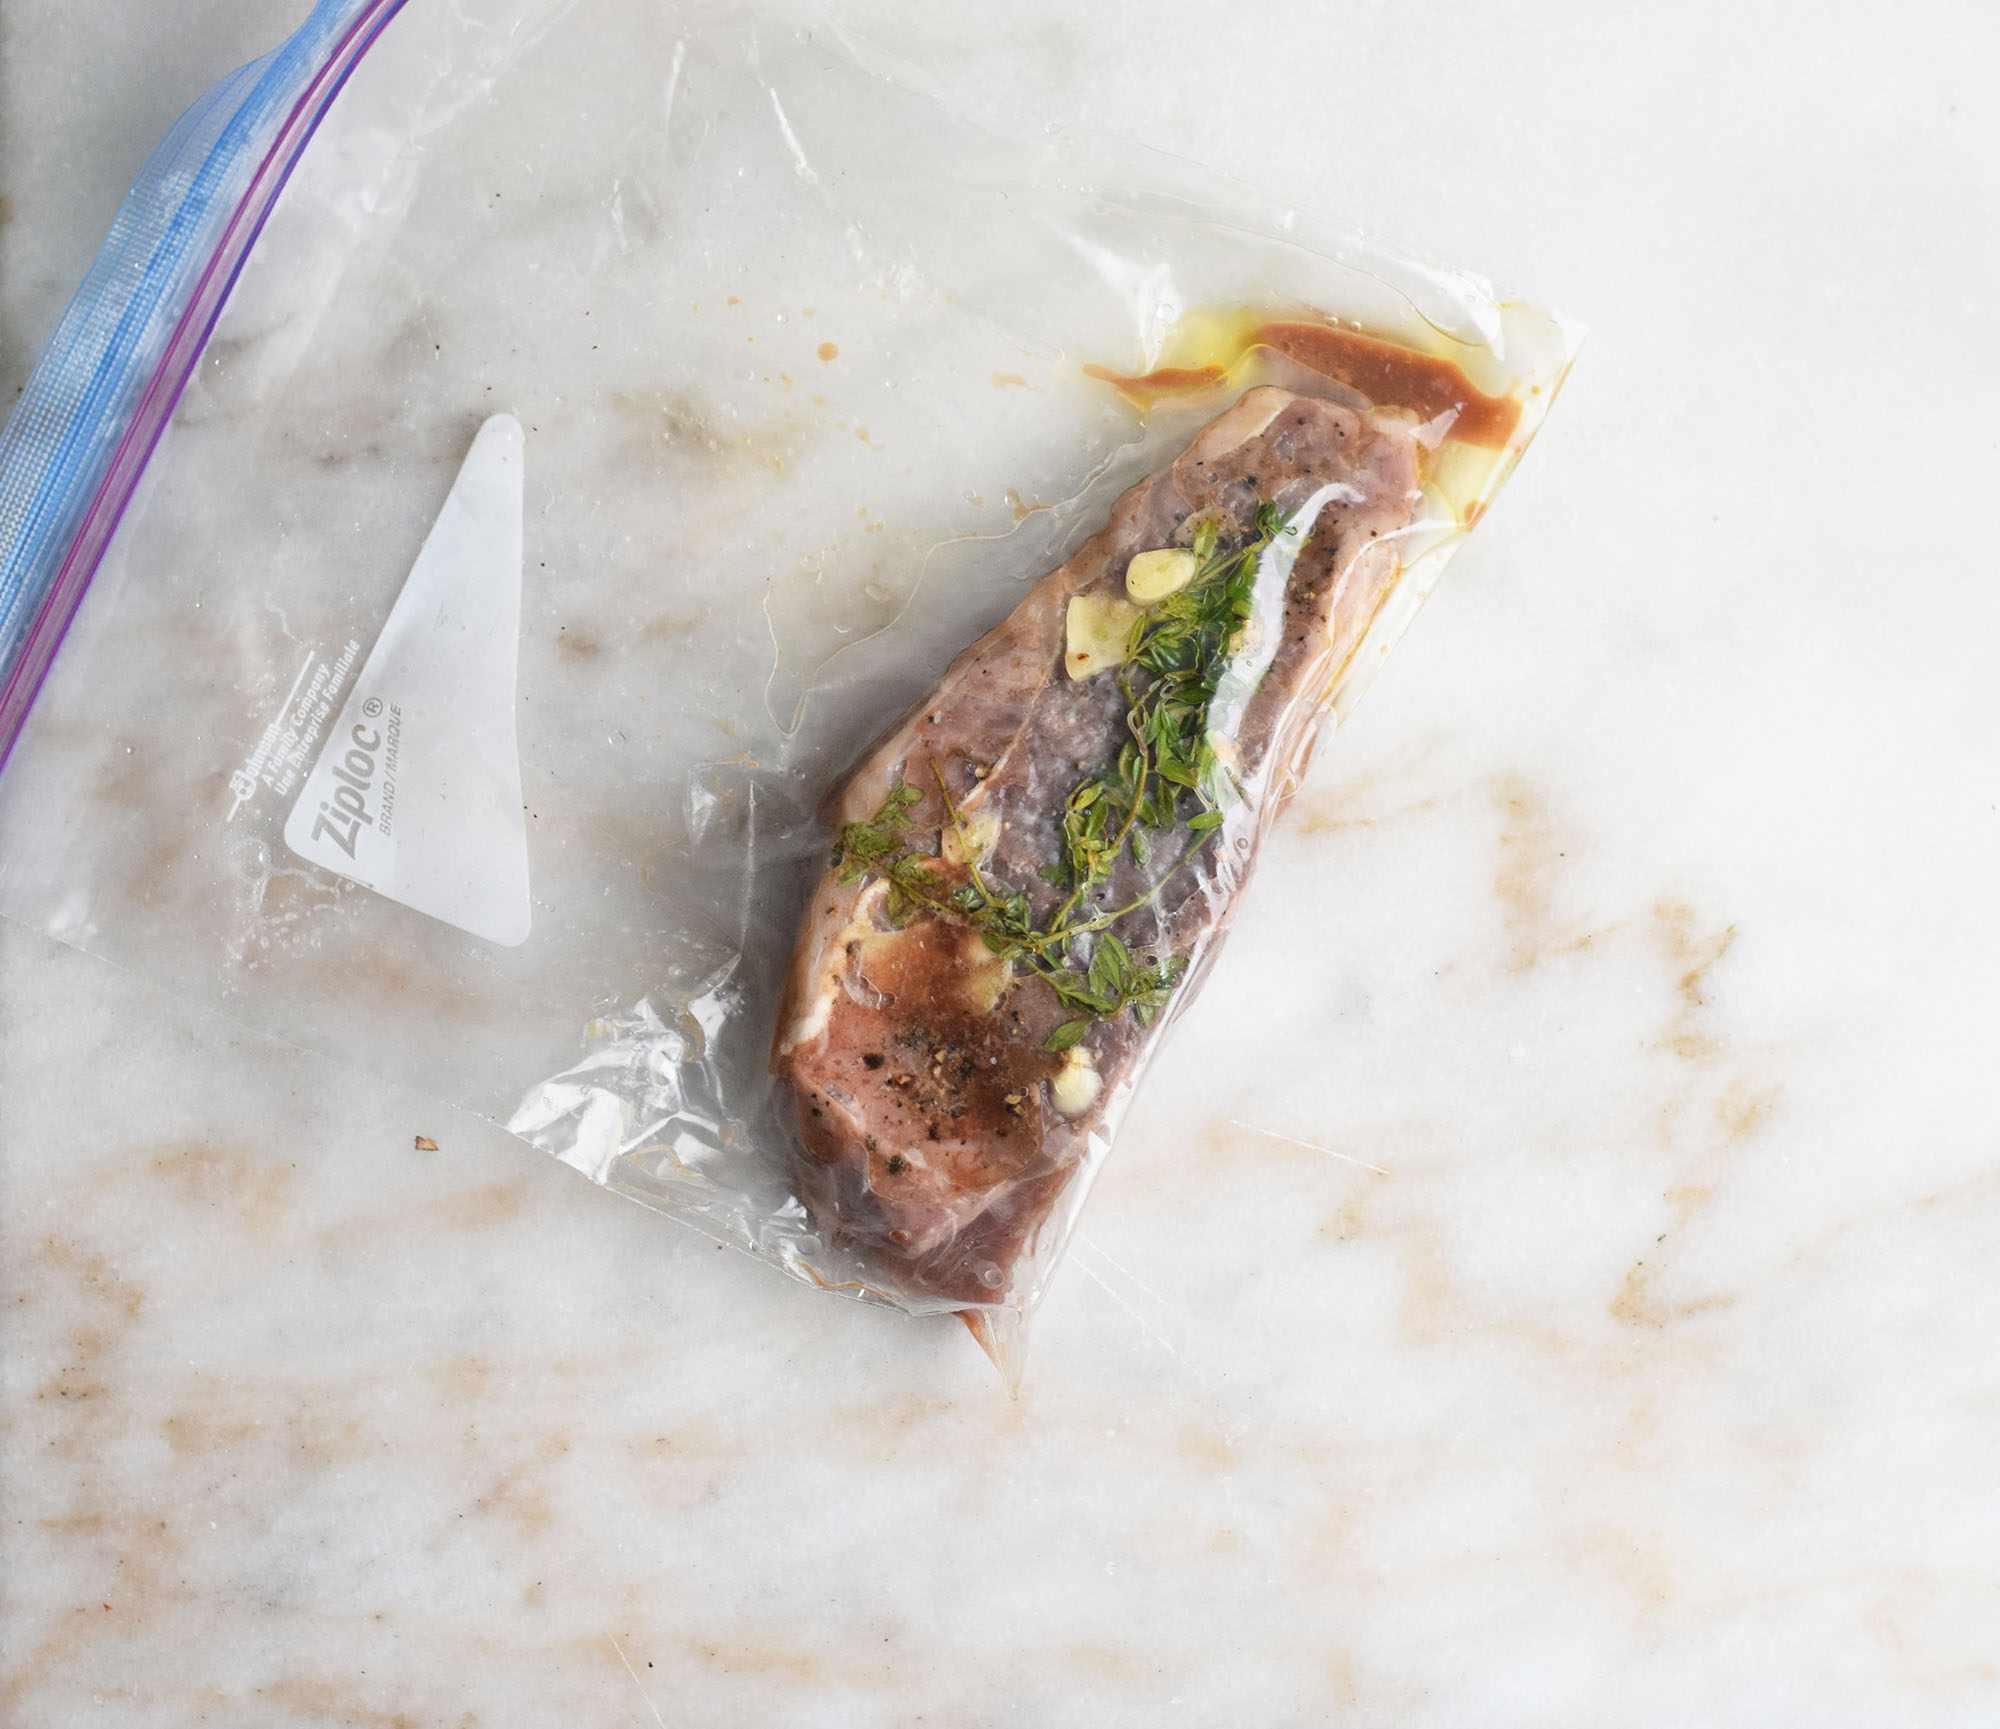 Sous vide steak in the bag